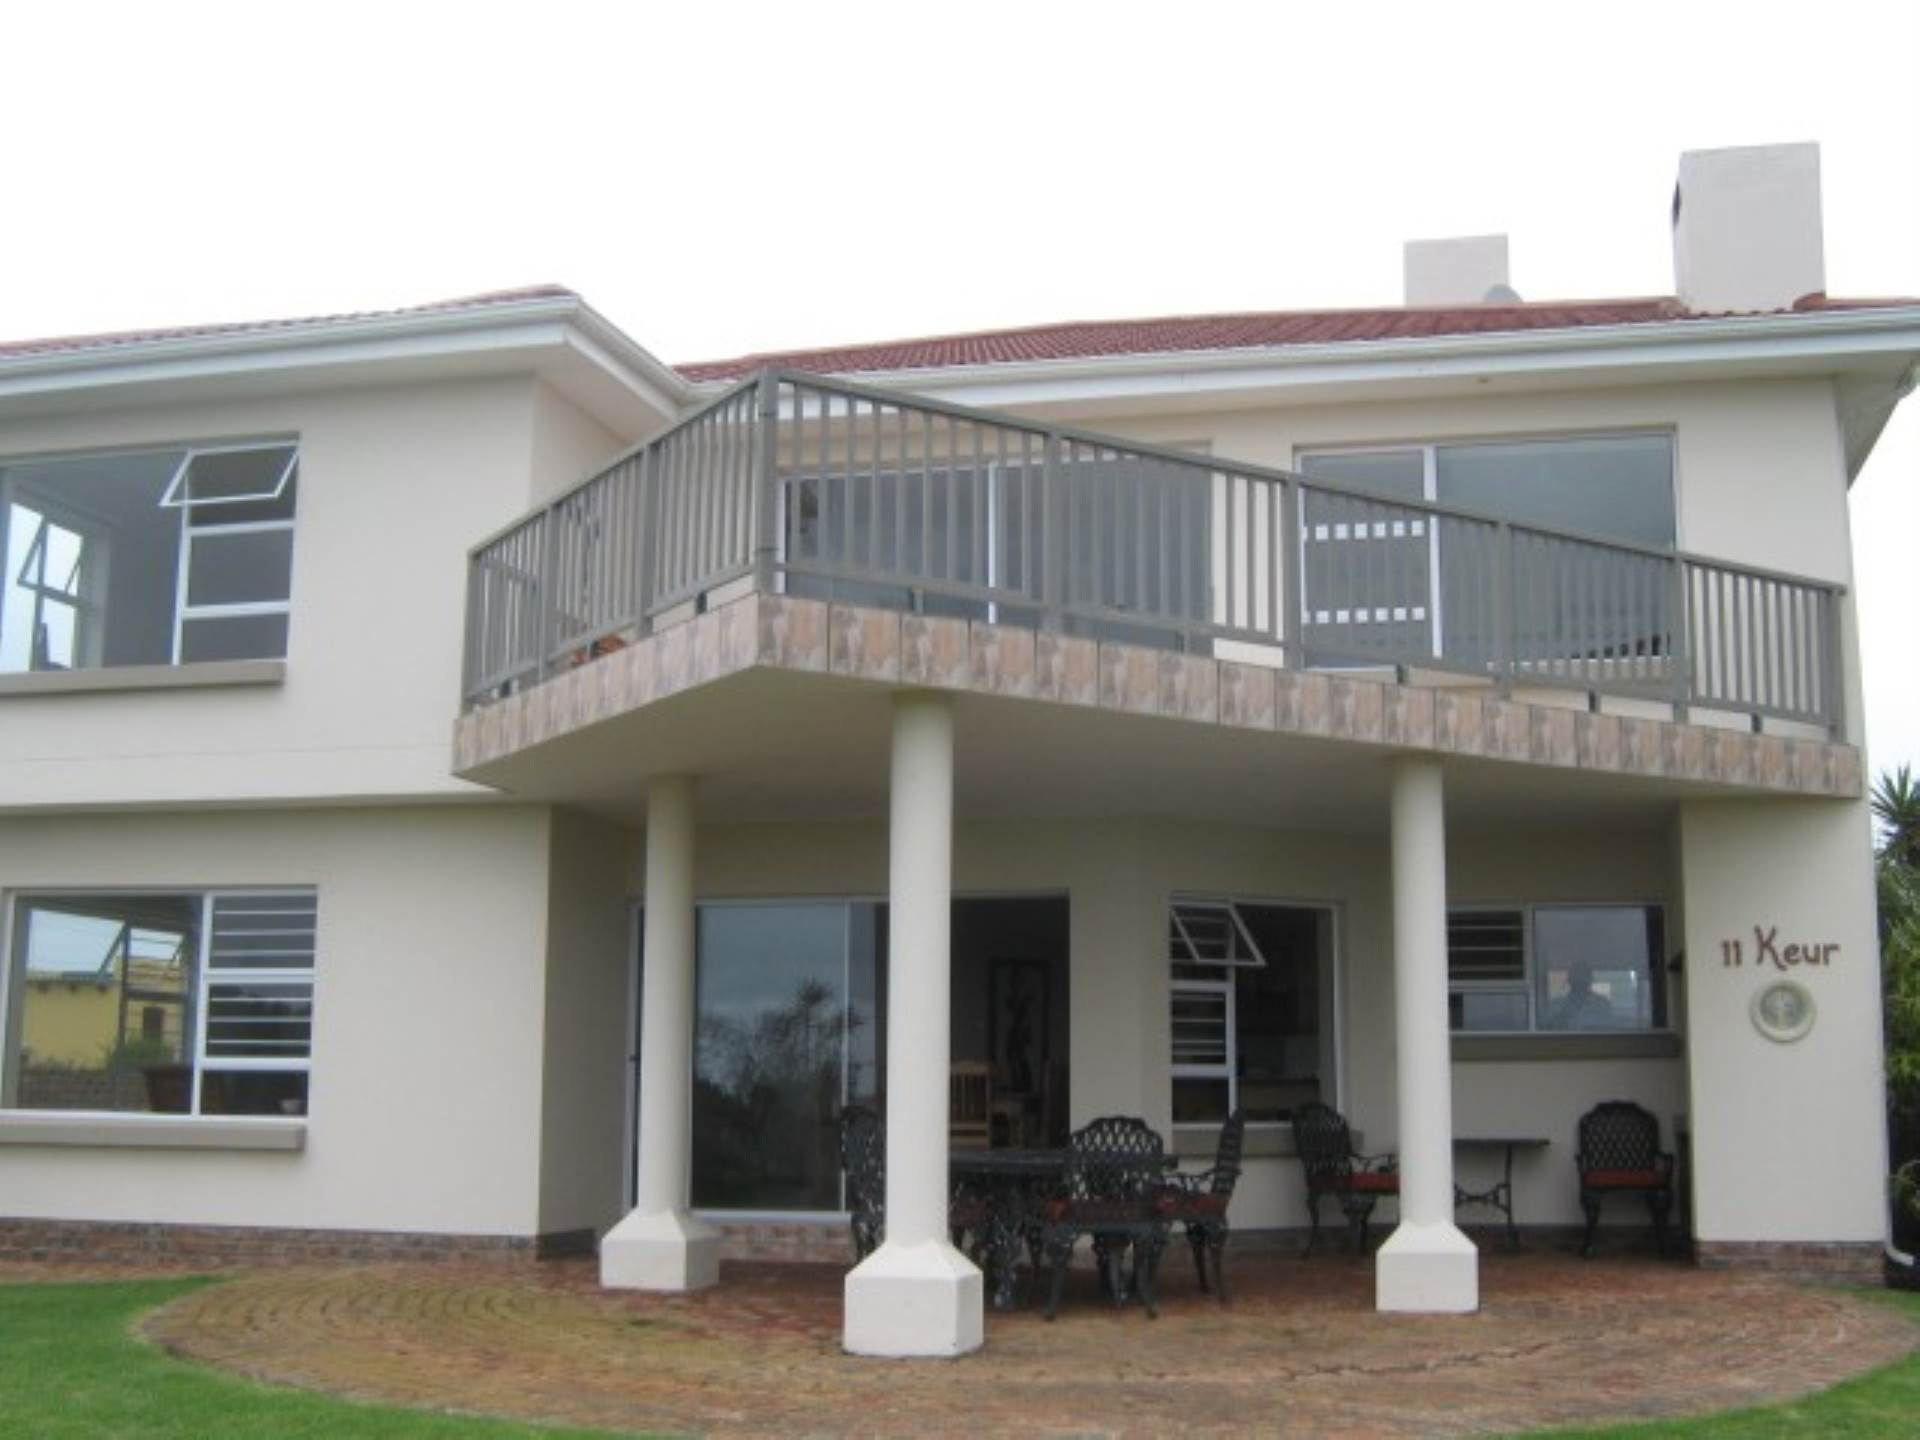 4 BedroomHouse For Sale In Boggomsbaai